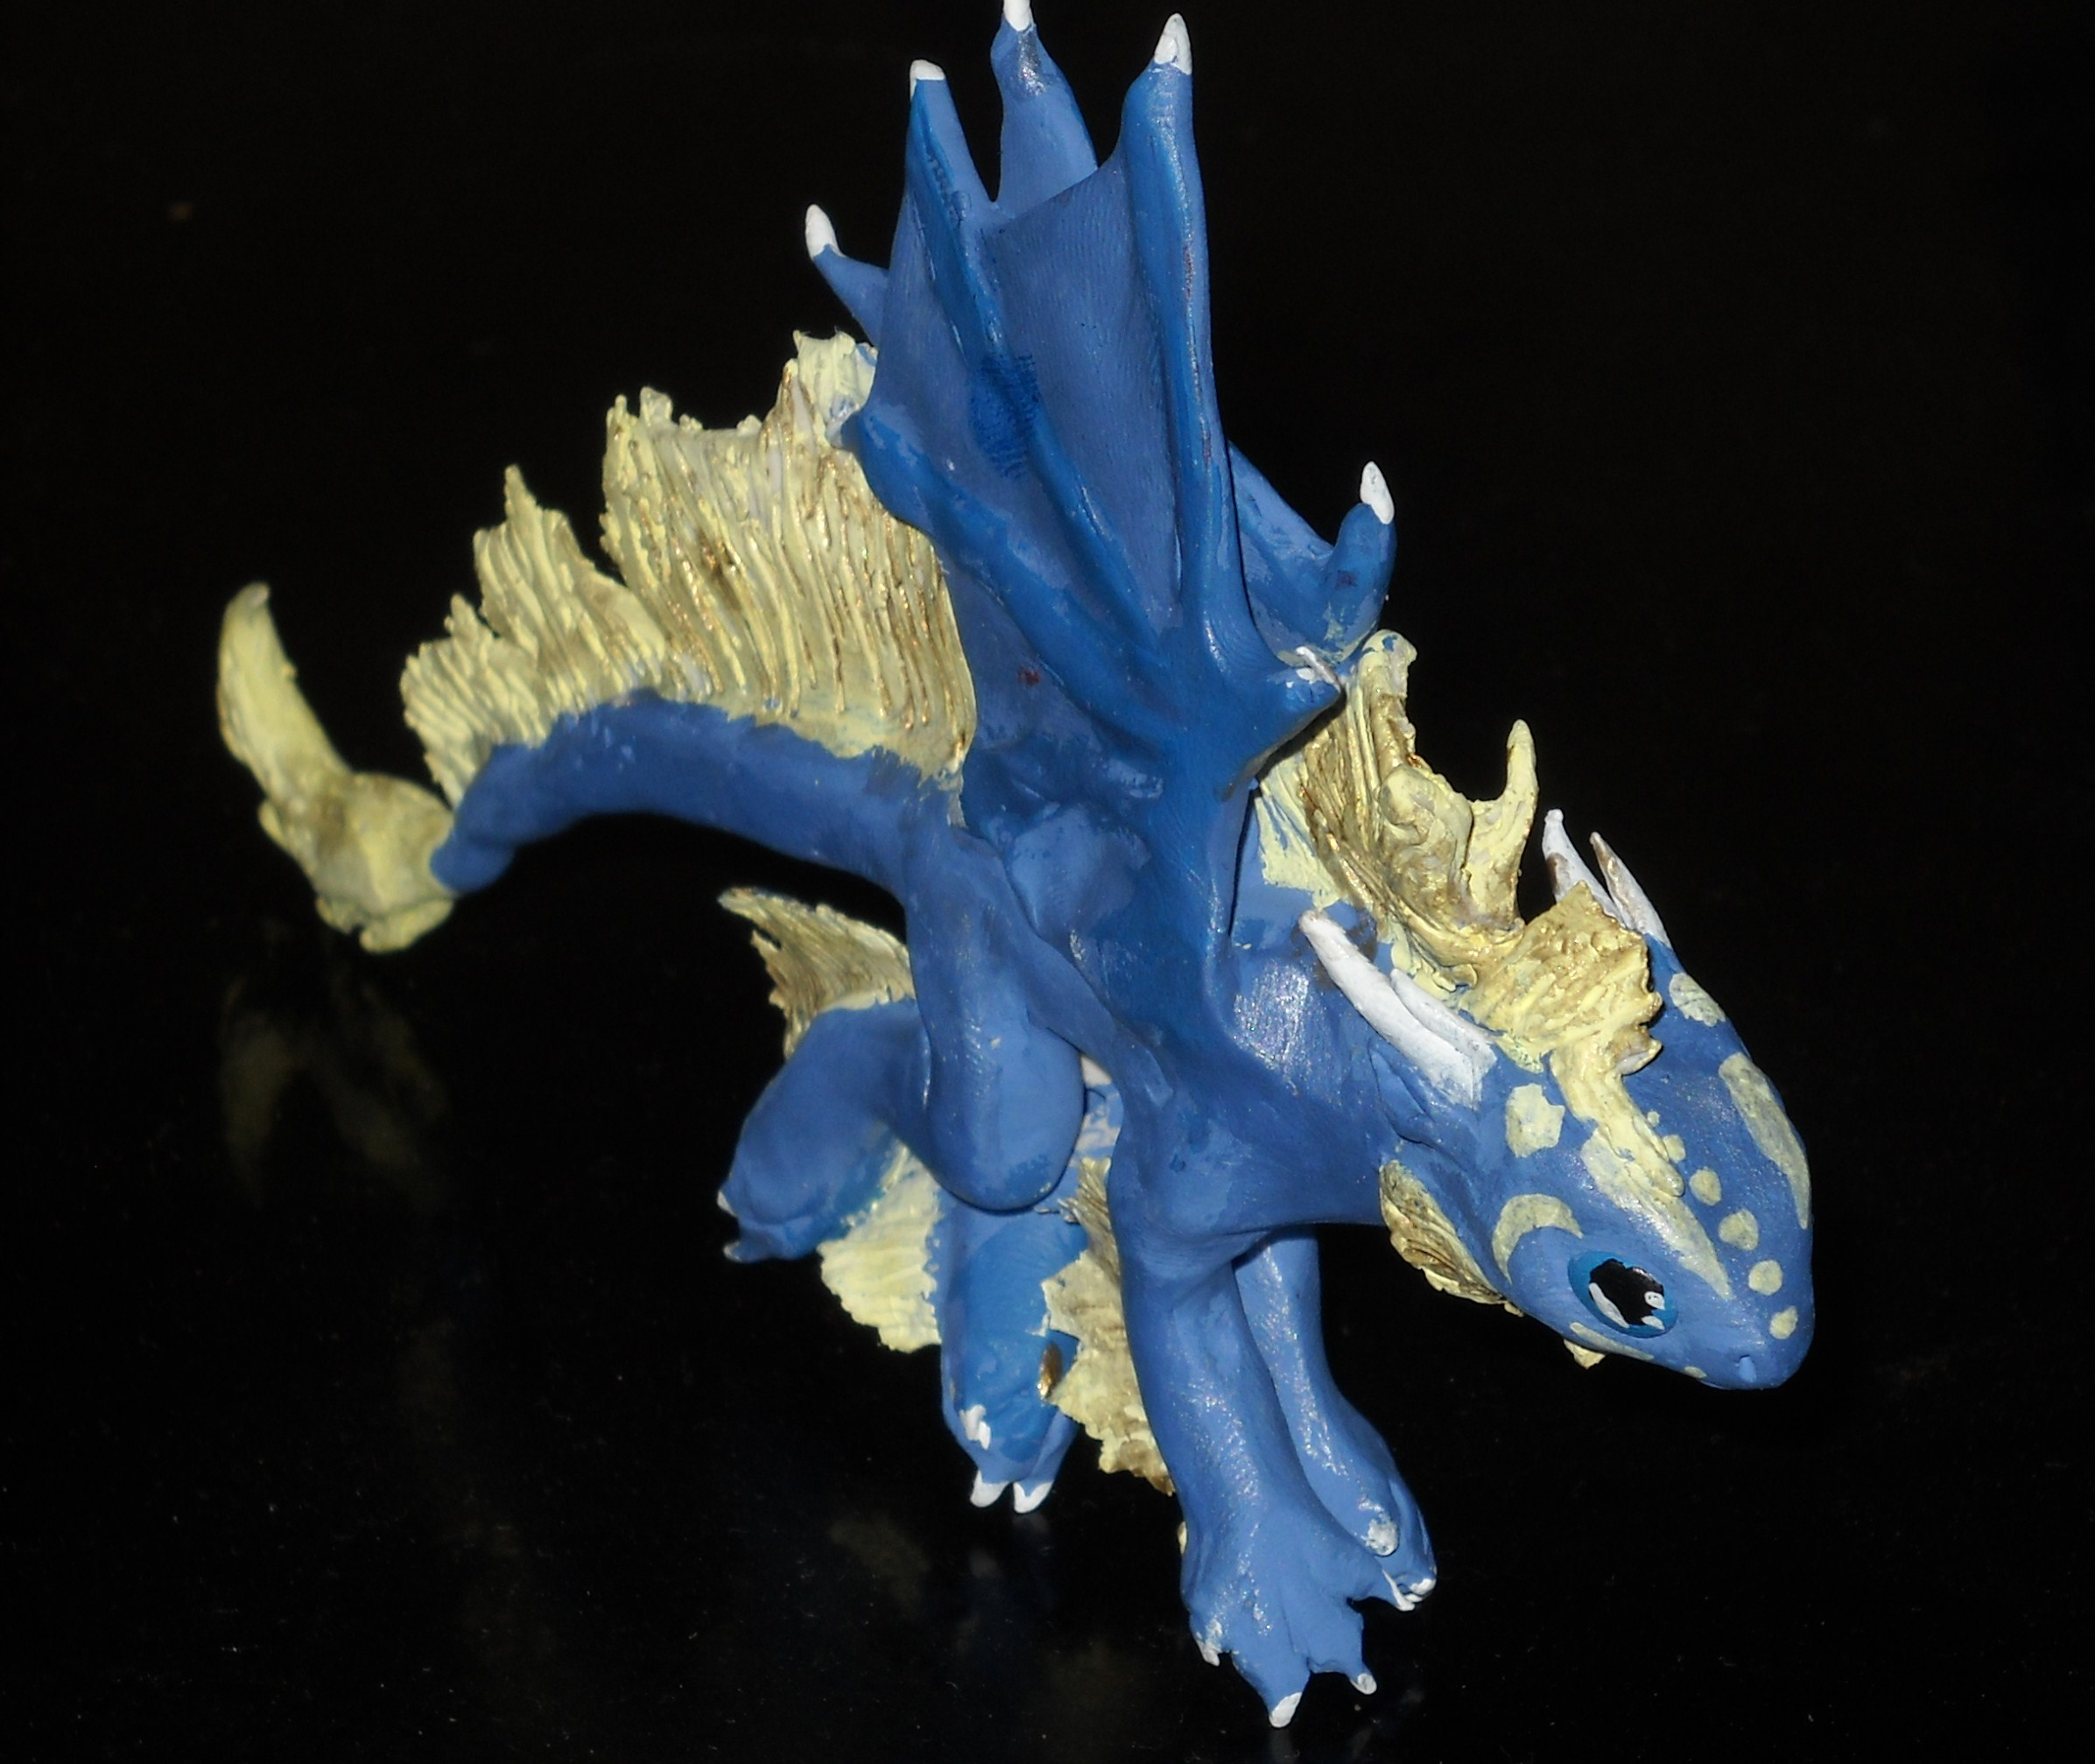 Сапфира дракон картинки 22 фотография